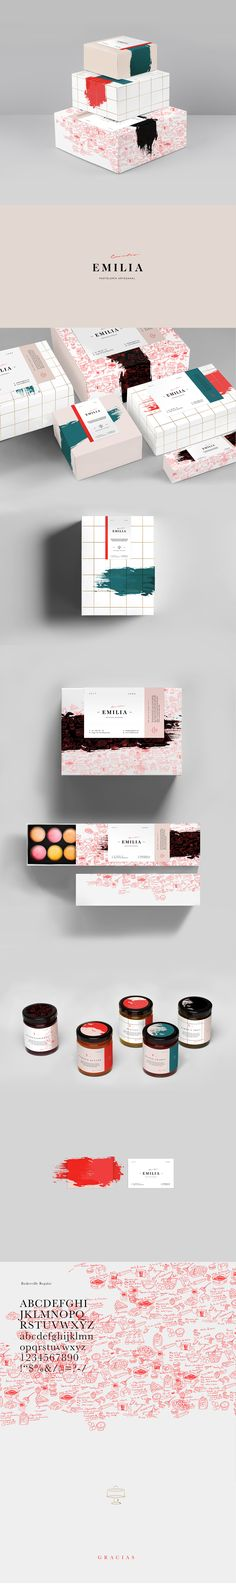 Karla Heredia Martinez의 Emilia Pasteleria Artesanal 포장 |  Fivestar Branding Agency - 디자인 및 브랜딩 대행사 및 큐레이터 영감 갤러리